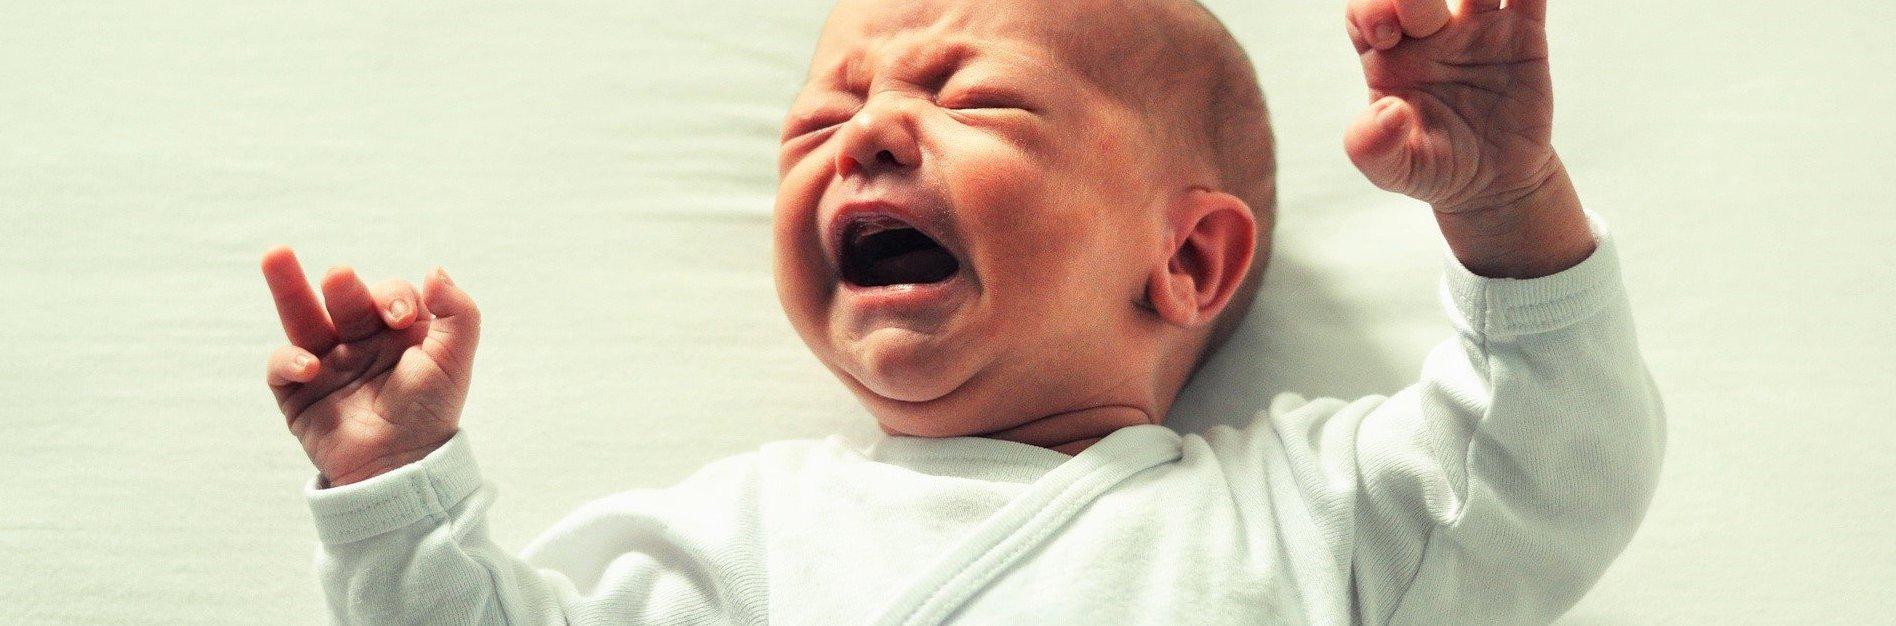 Huilende baby in witte romper